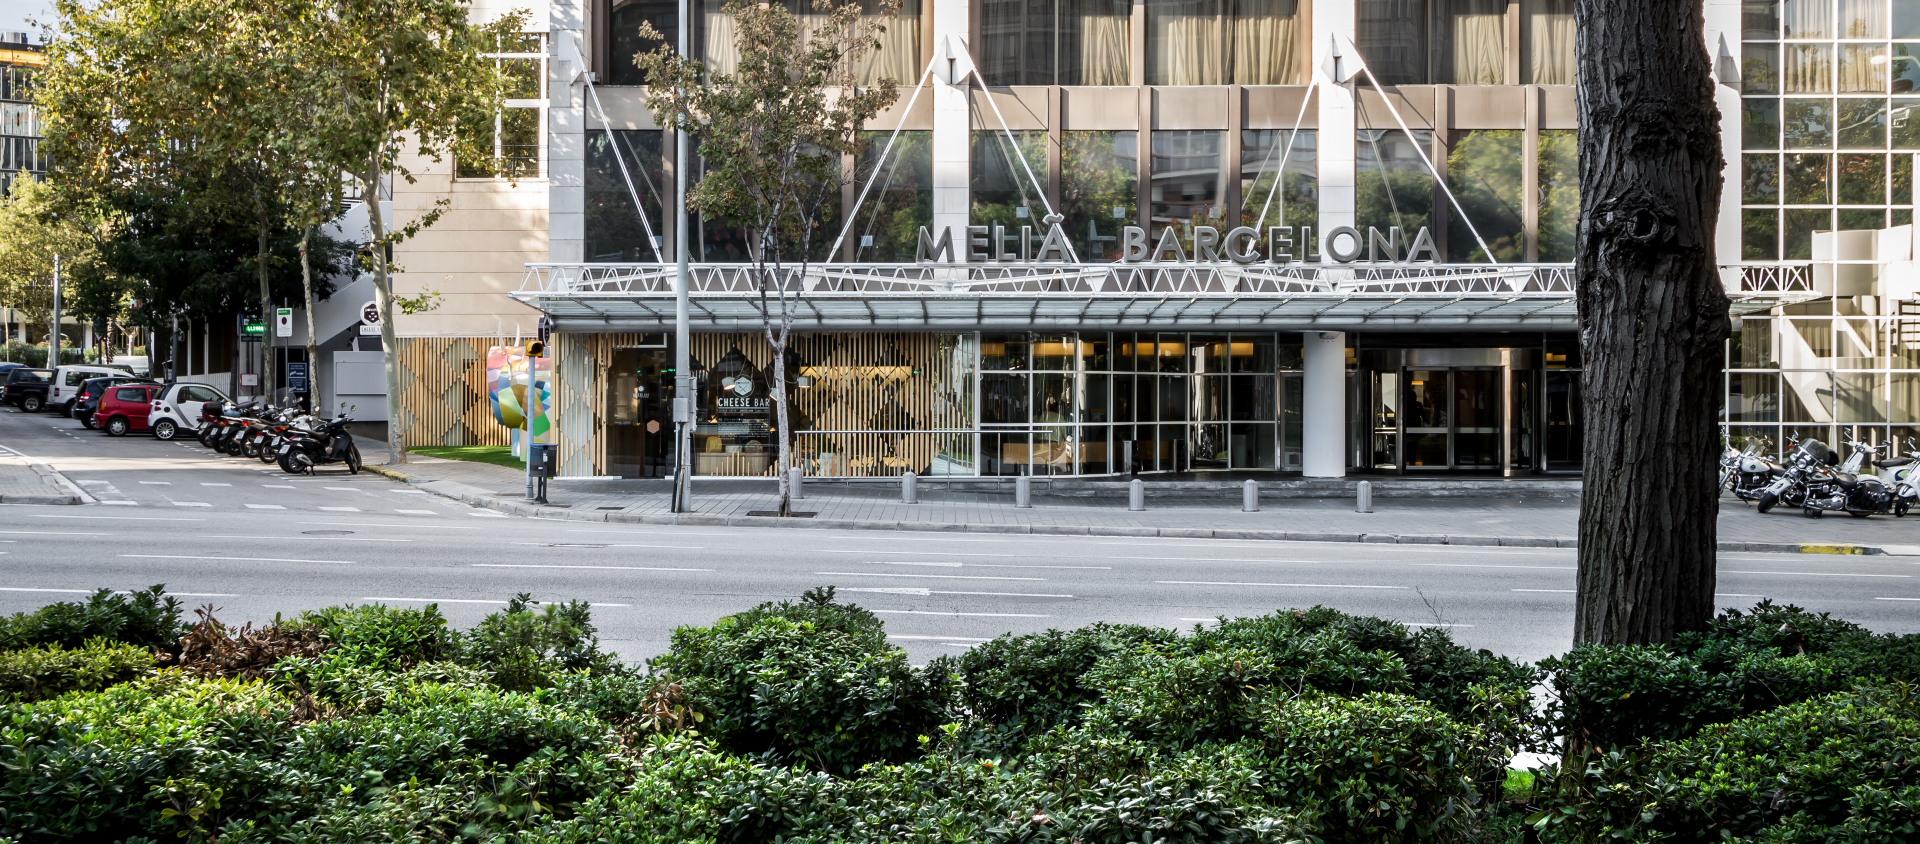 fotografia-arquitectura-valencia-german-cabo-estudihac-poncelet-cheese-bar-barcelona (1)